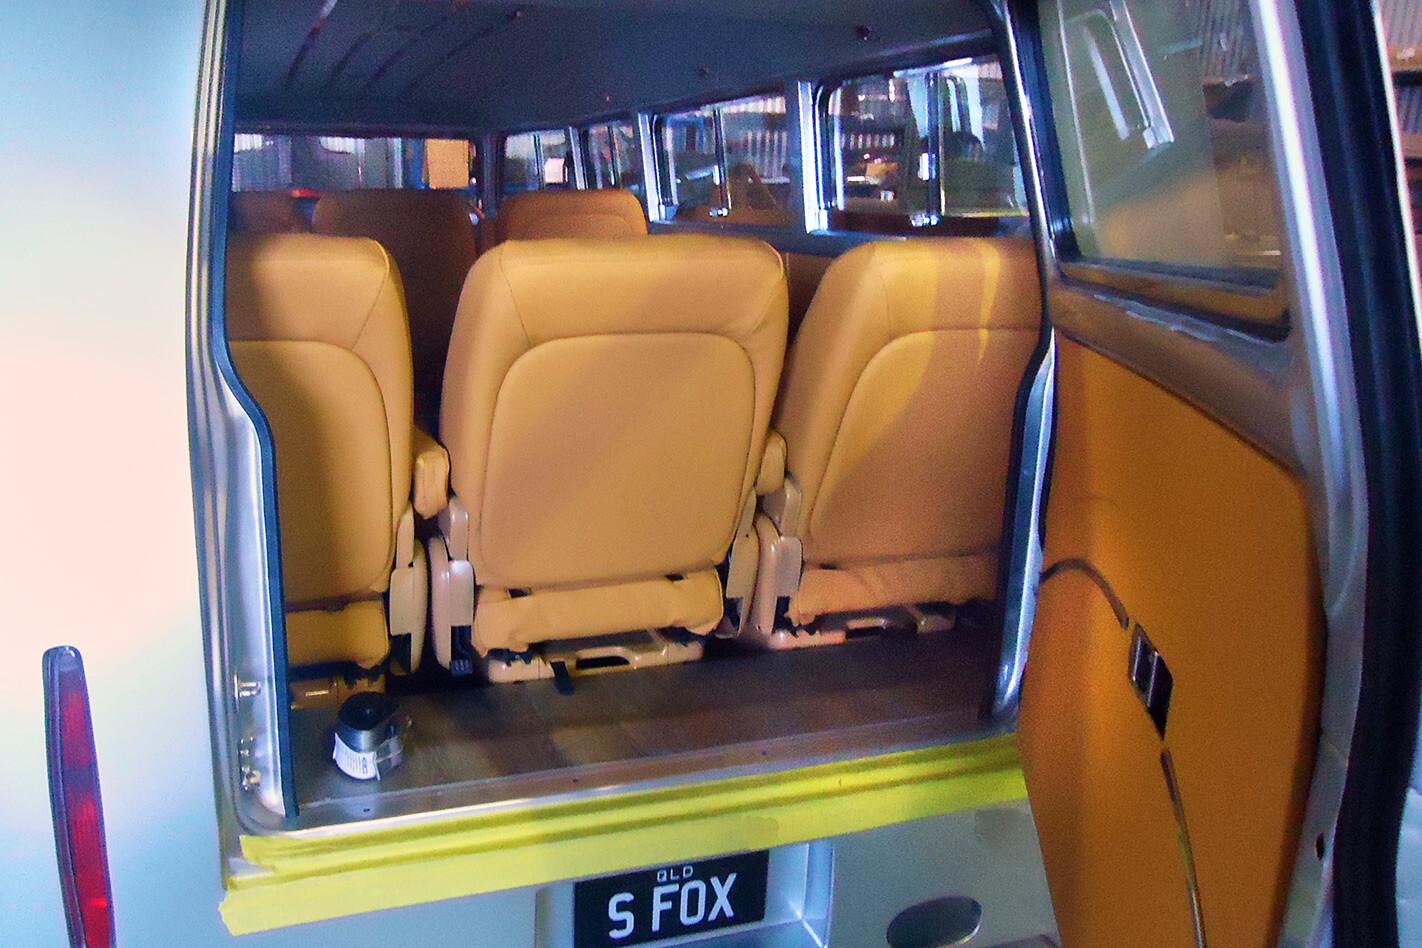 Silver Fox Bus rear